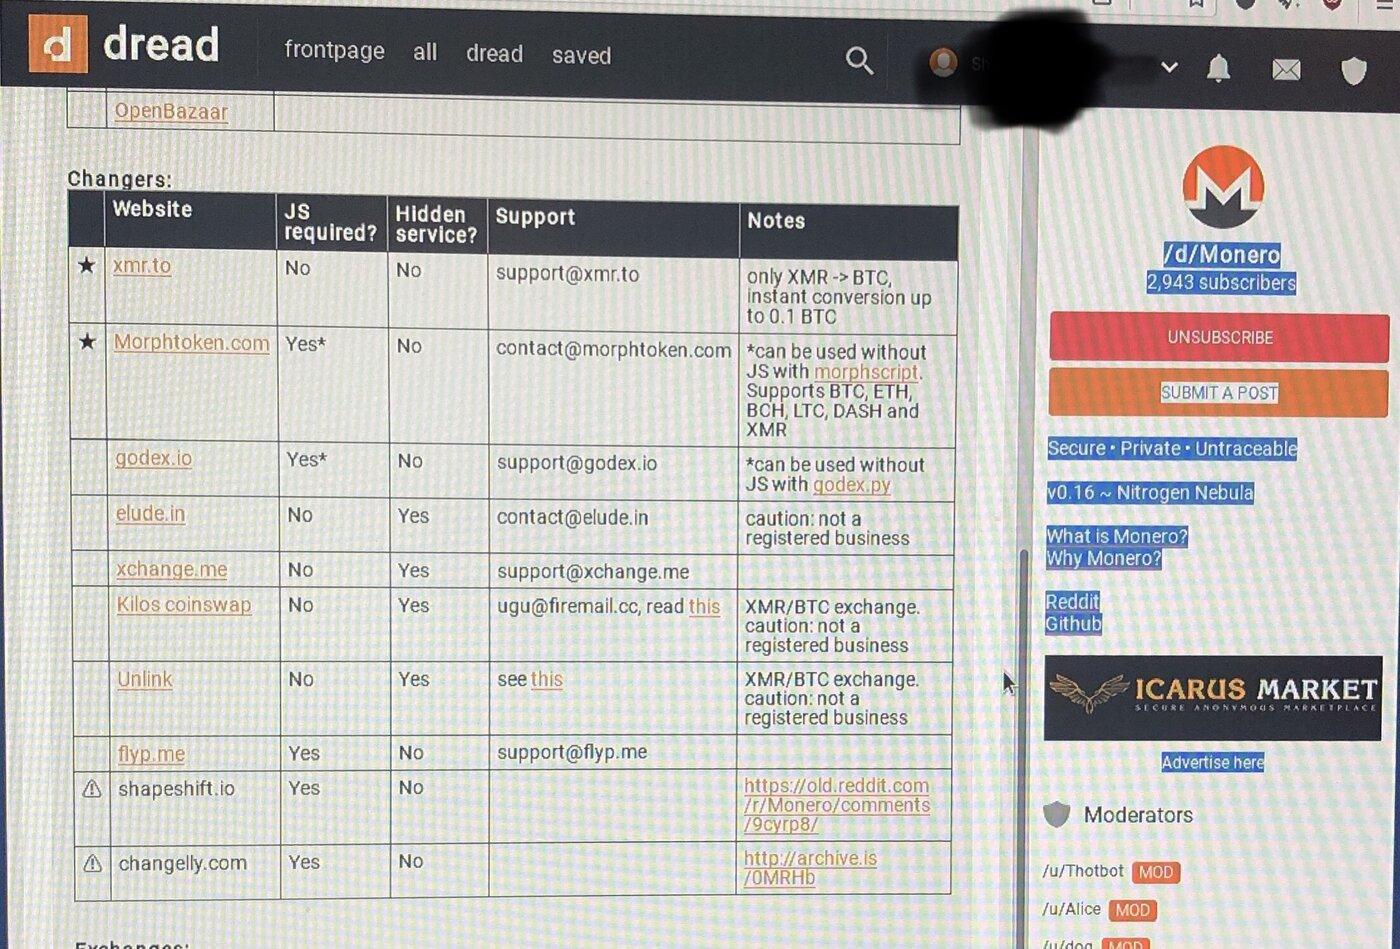 A screenshot of the Dread darknet community forum